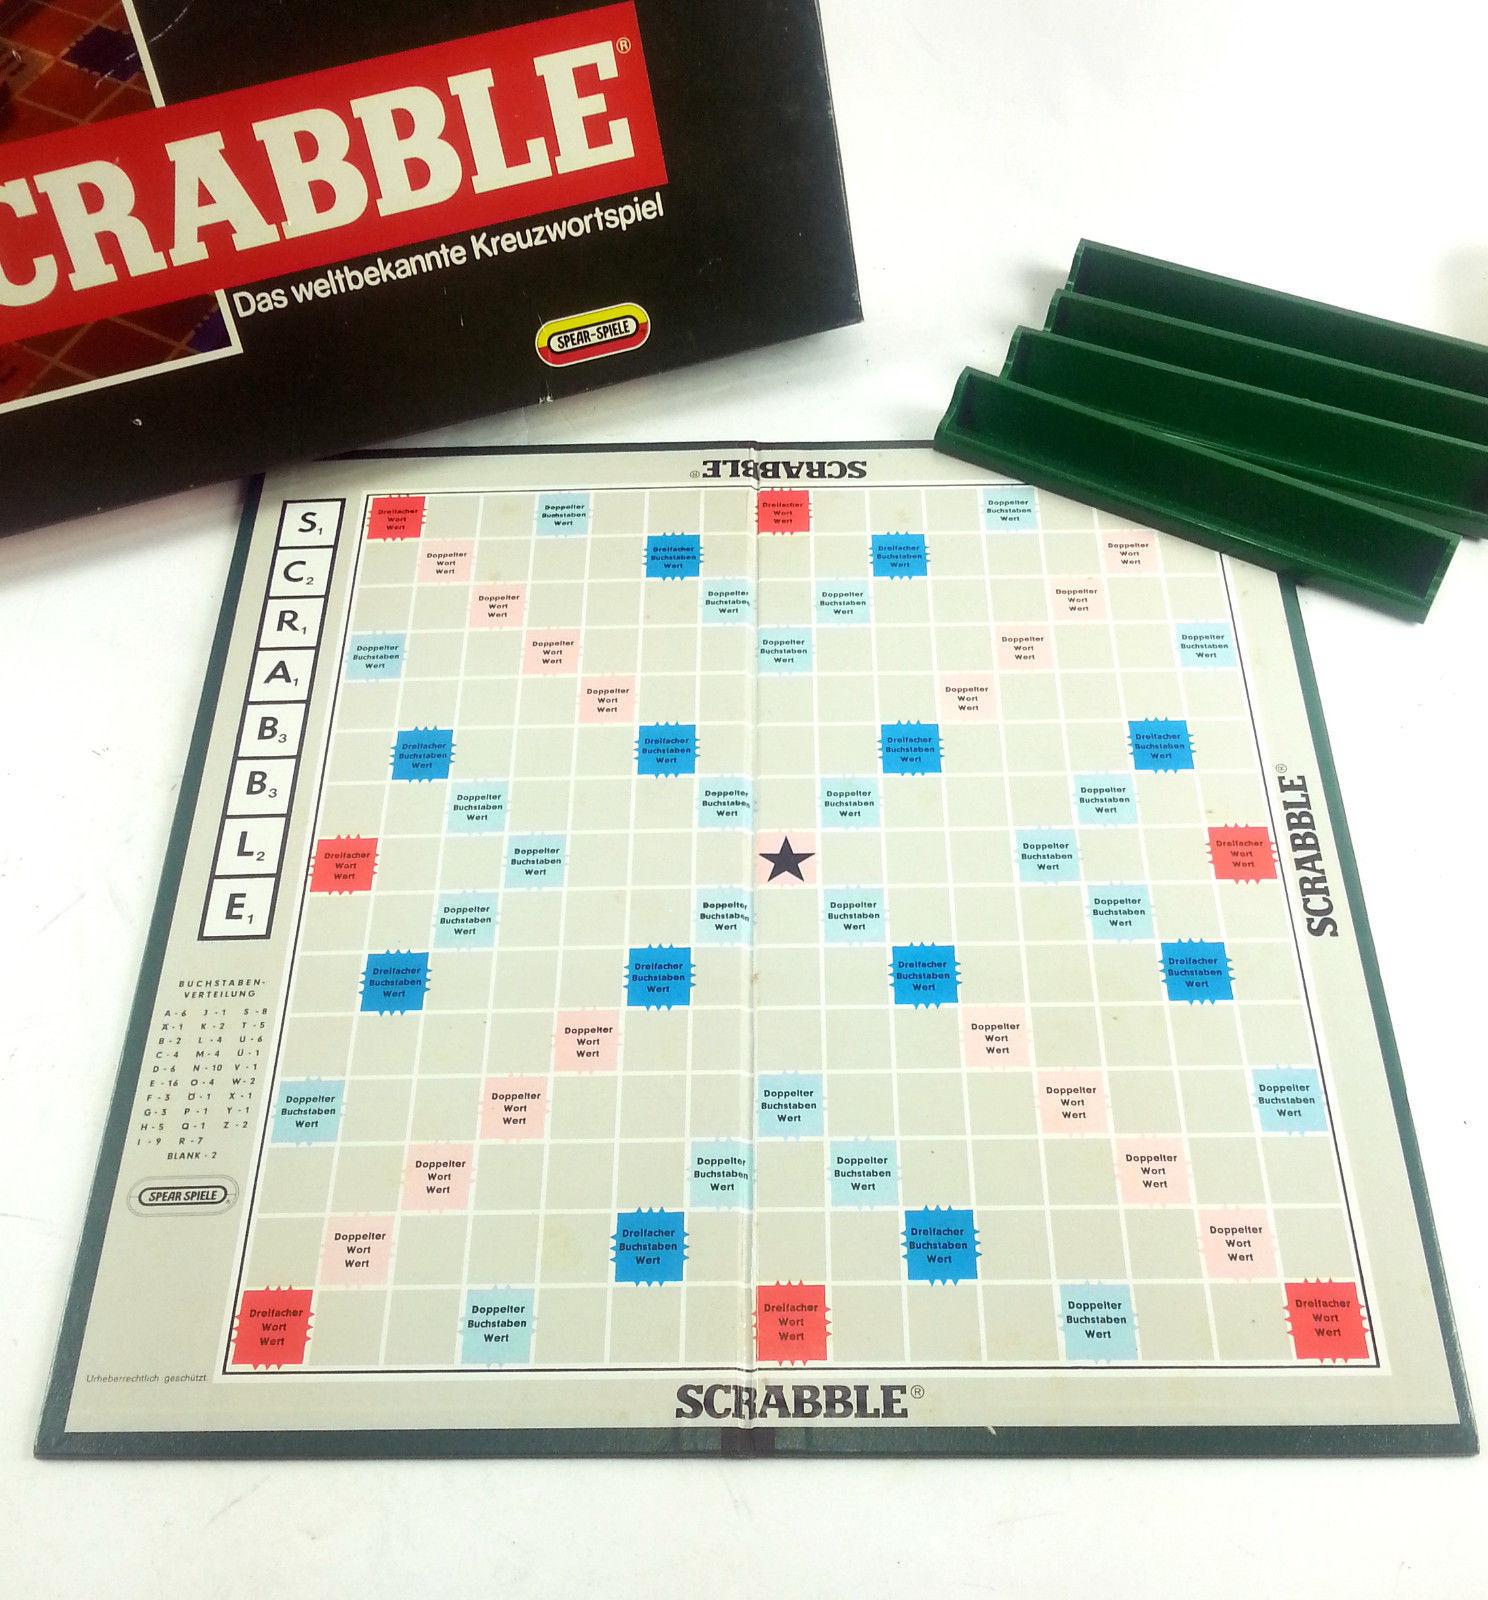 Scrabble Mattel Download